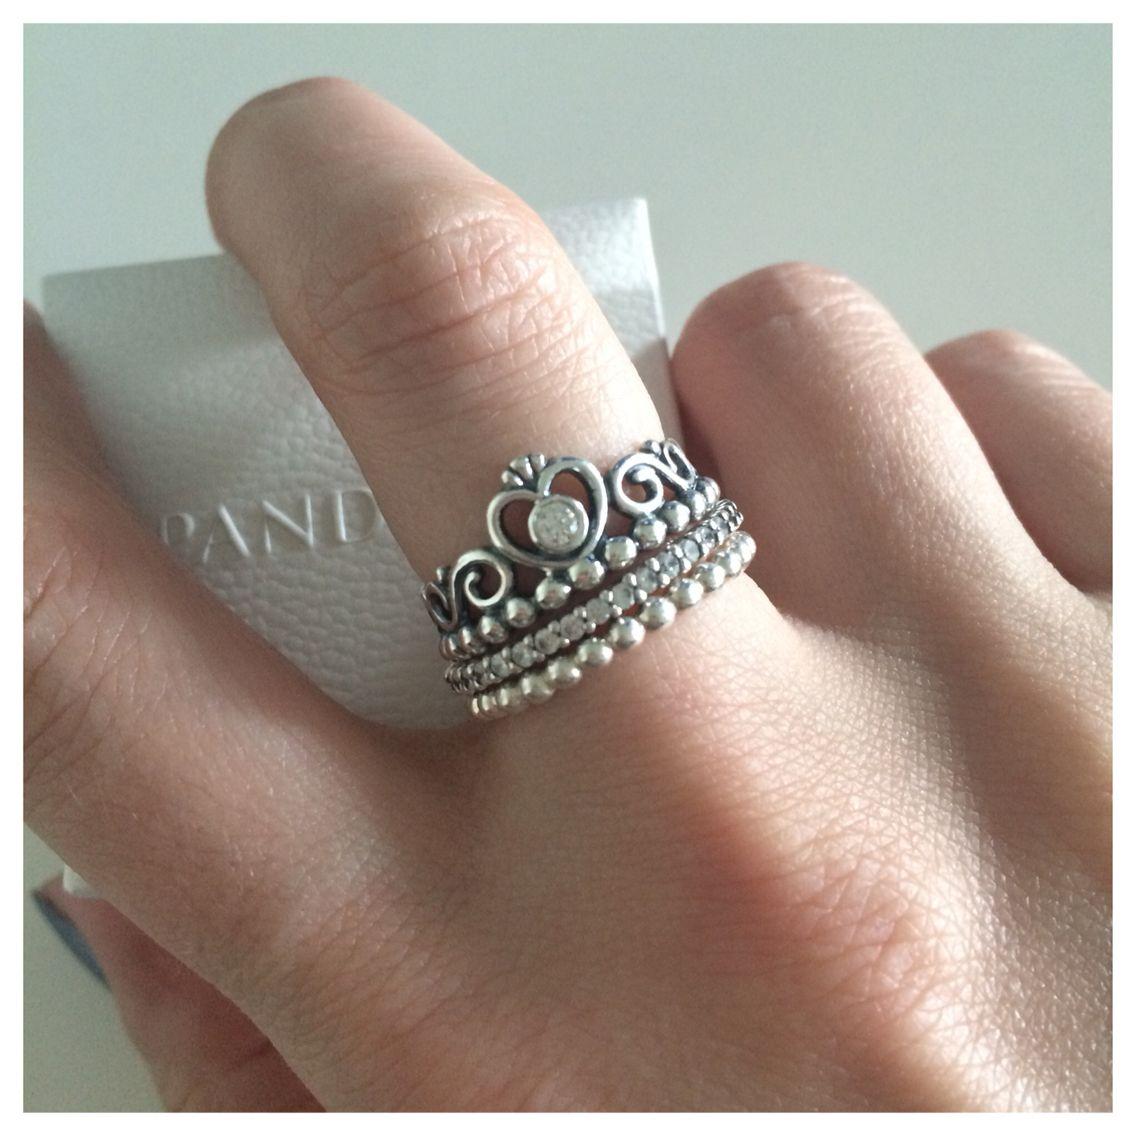 Pandora Princess Ring Stacked With 2 Small Pandora Rings